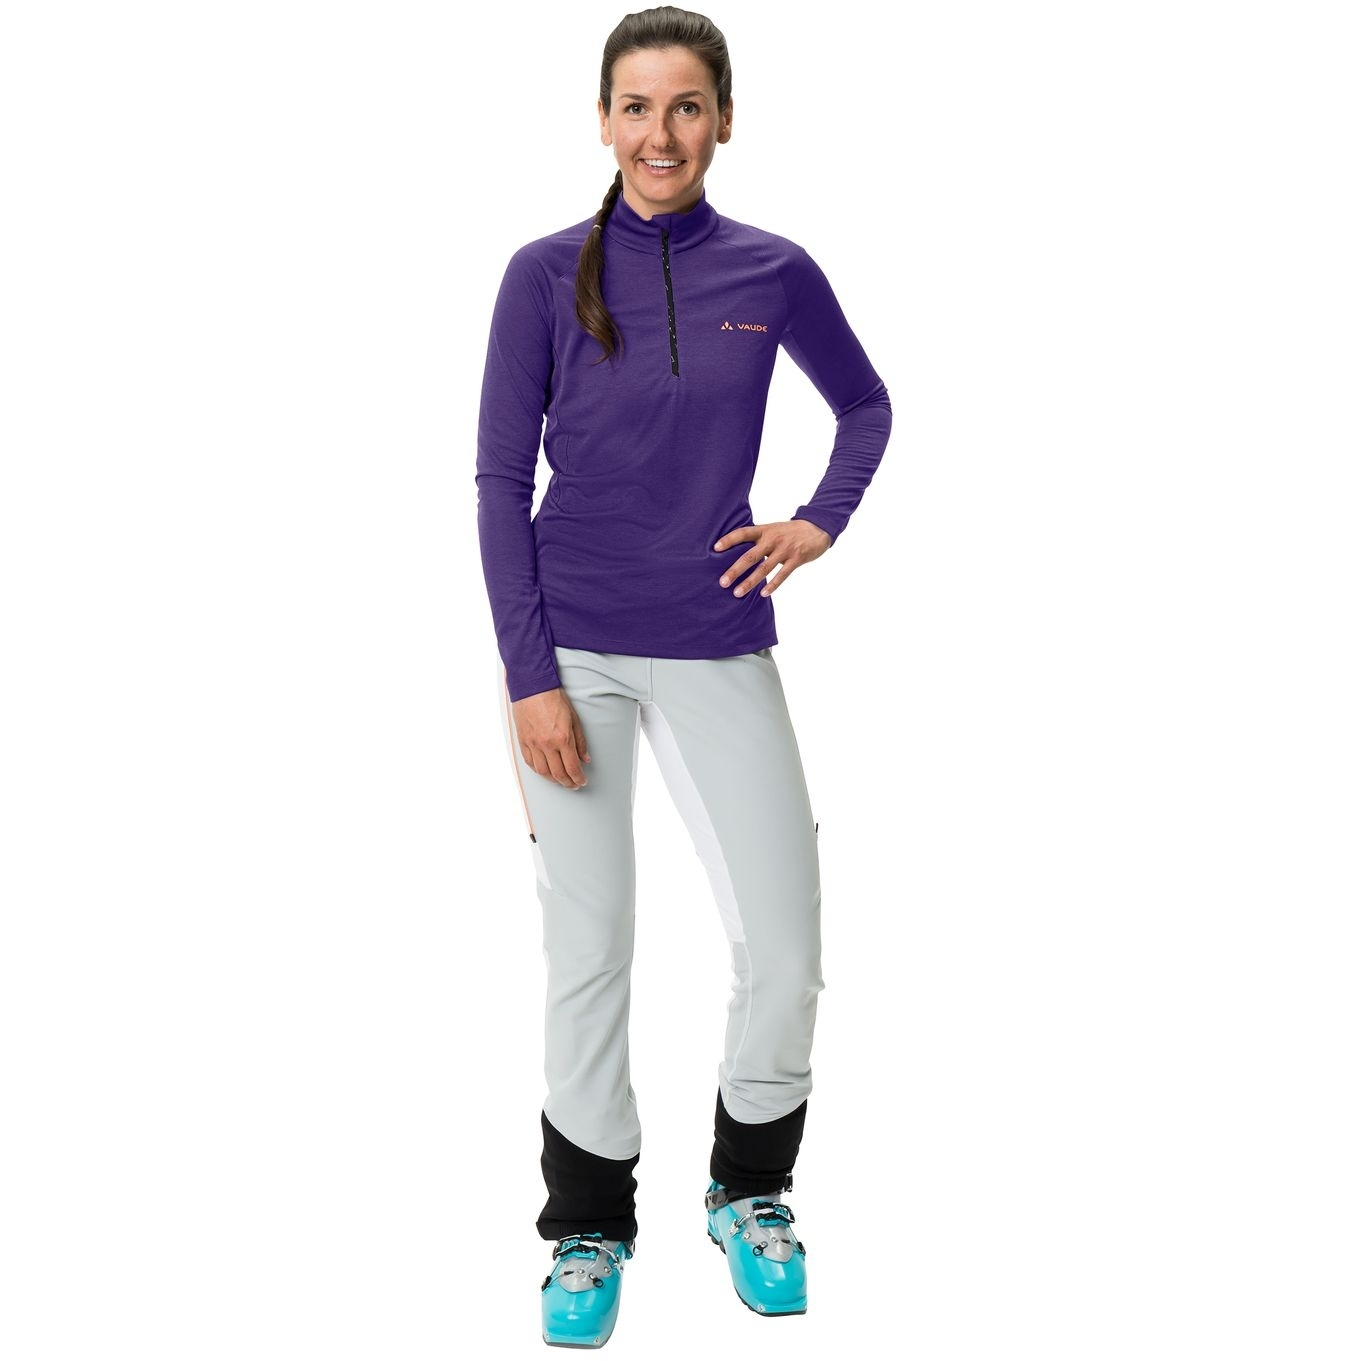 Bild von Vaude Larice Light Shirt II Damenpullover - dark purple